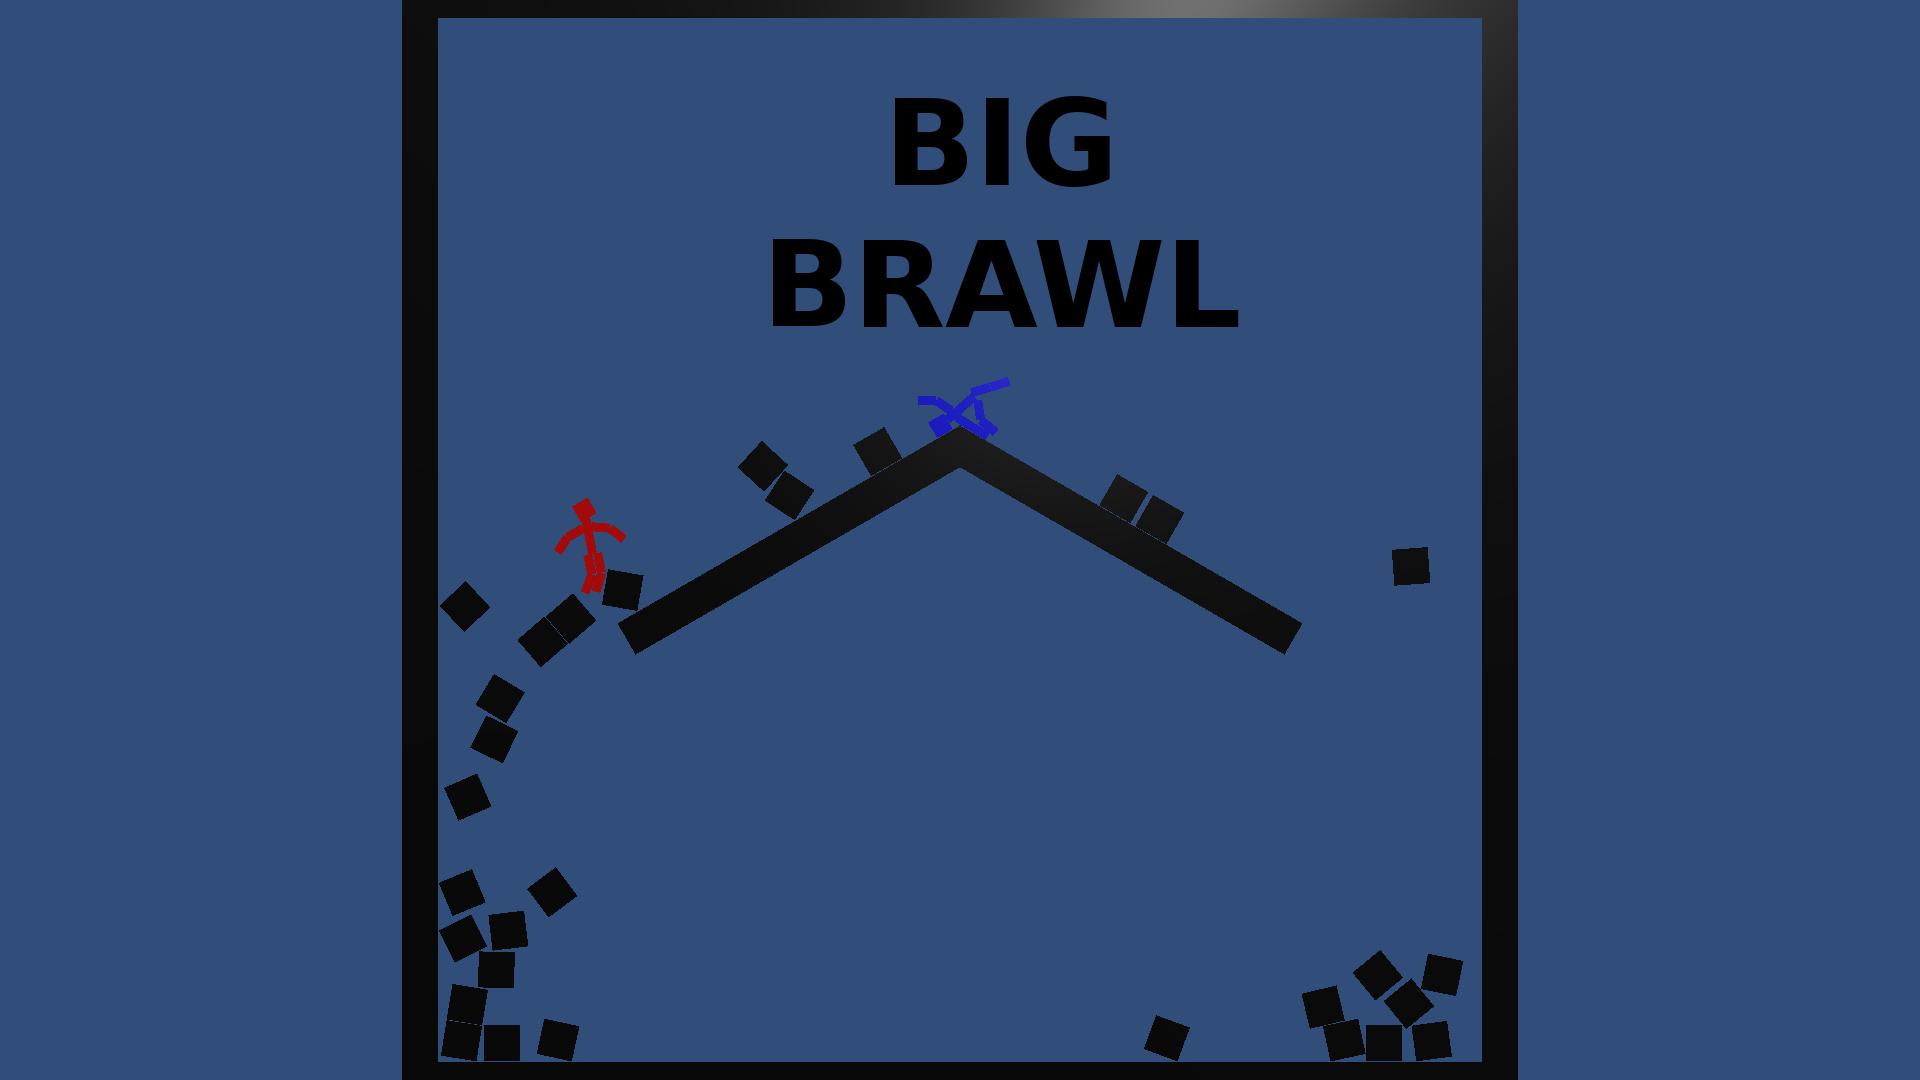 BIG BRAWL